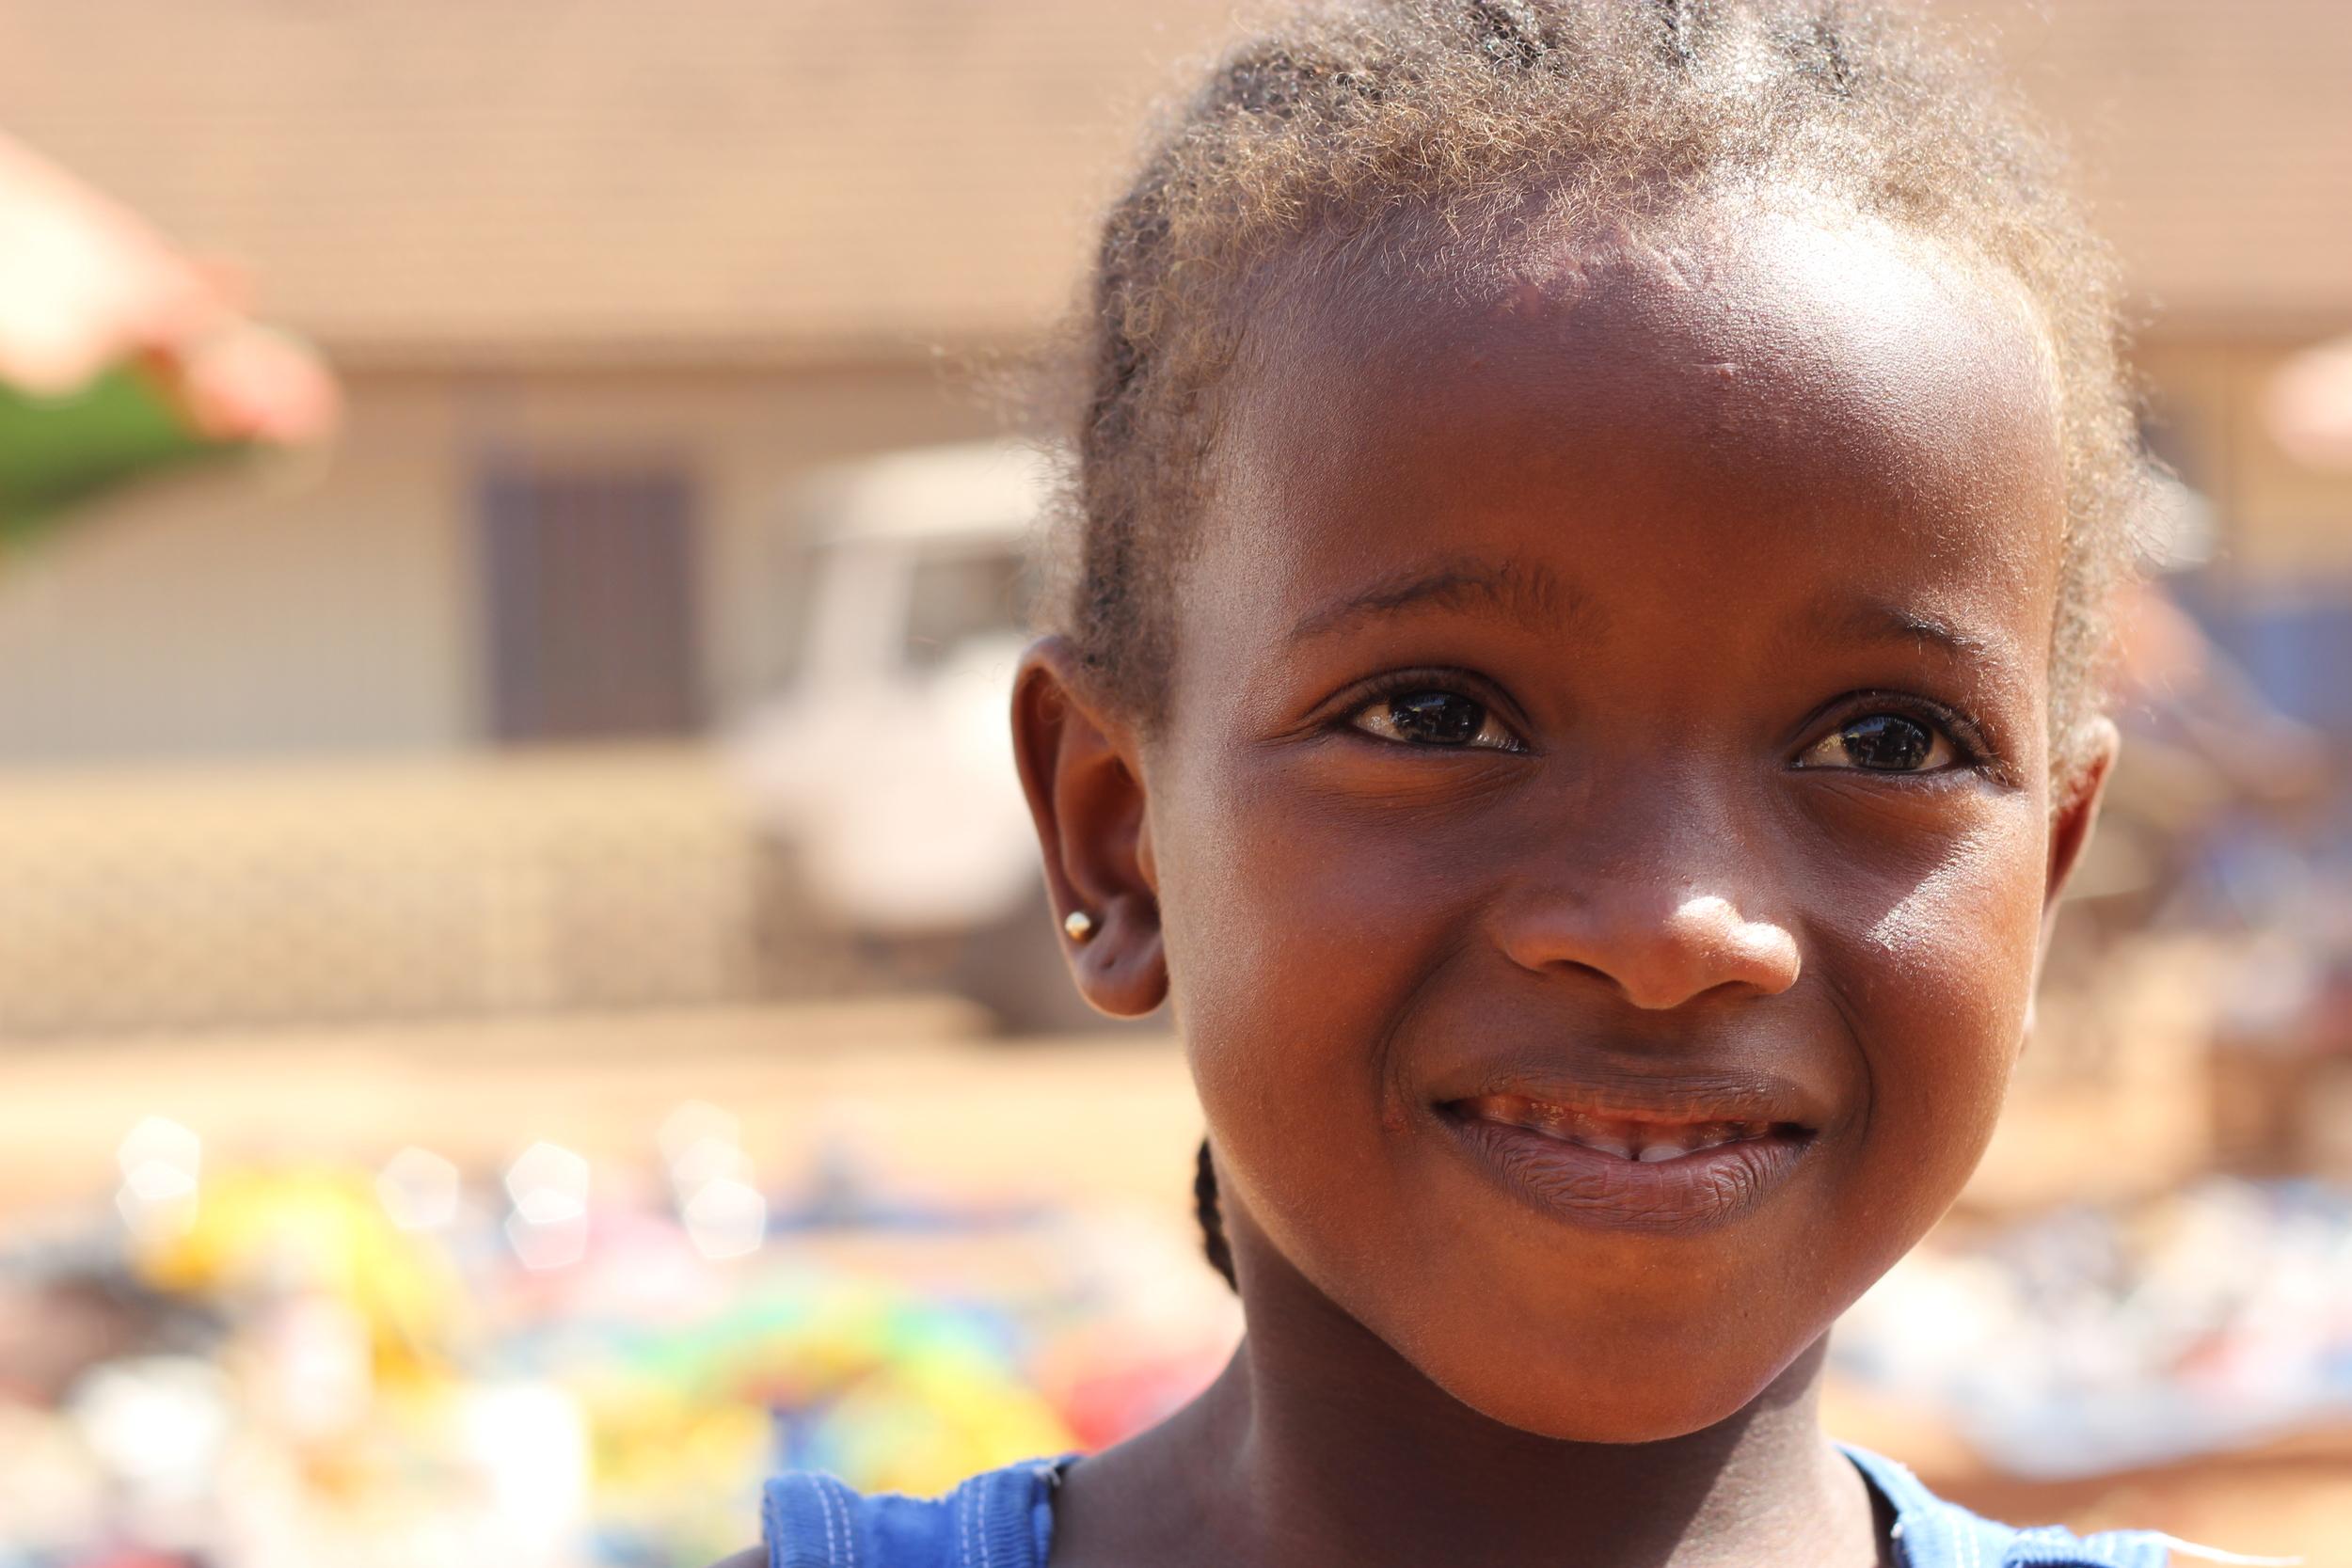 Little girl in Guinea Bissau West Africa